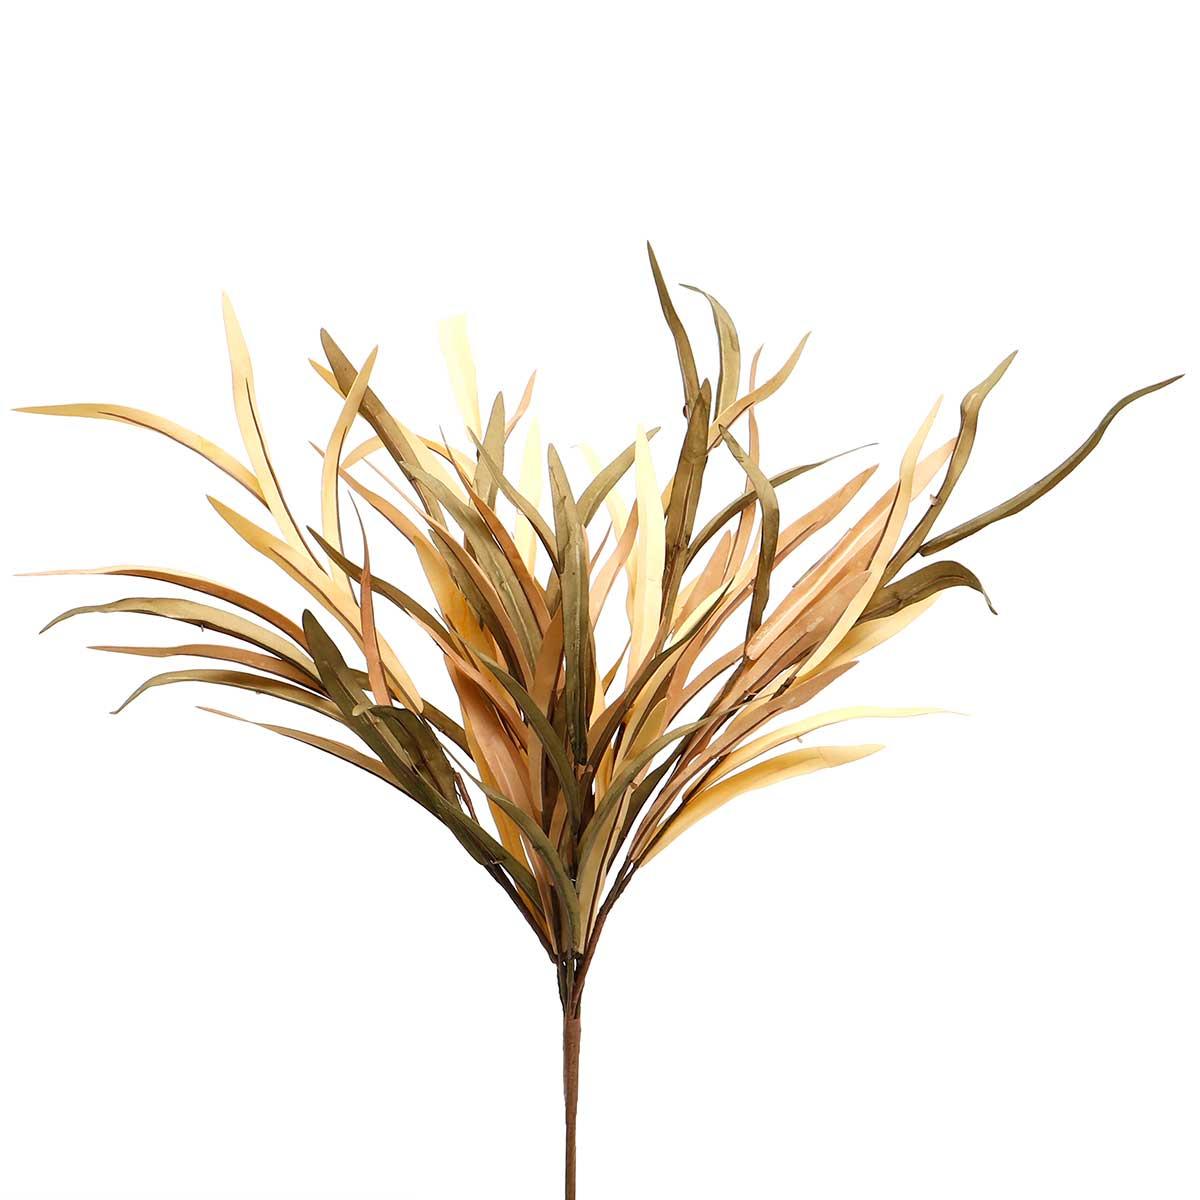 "AUTUMN GRASS BUSH 15""X24"" -MeraVic Exclusive Design"